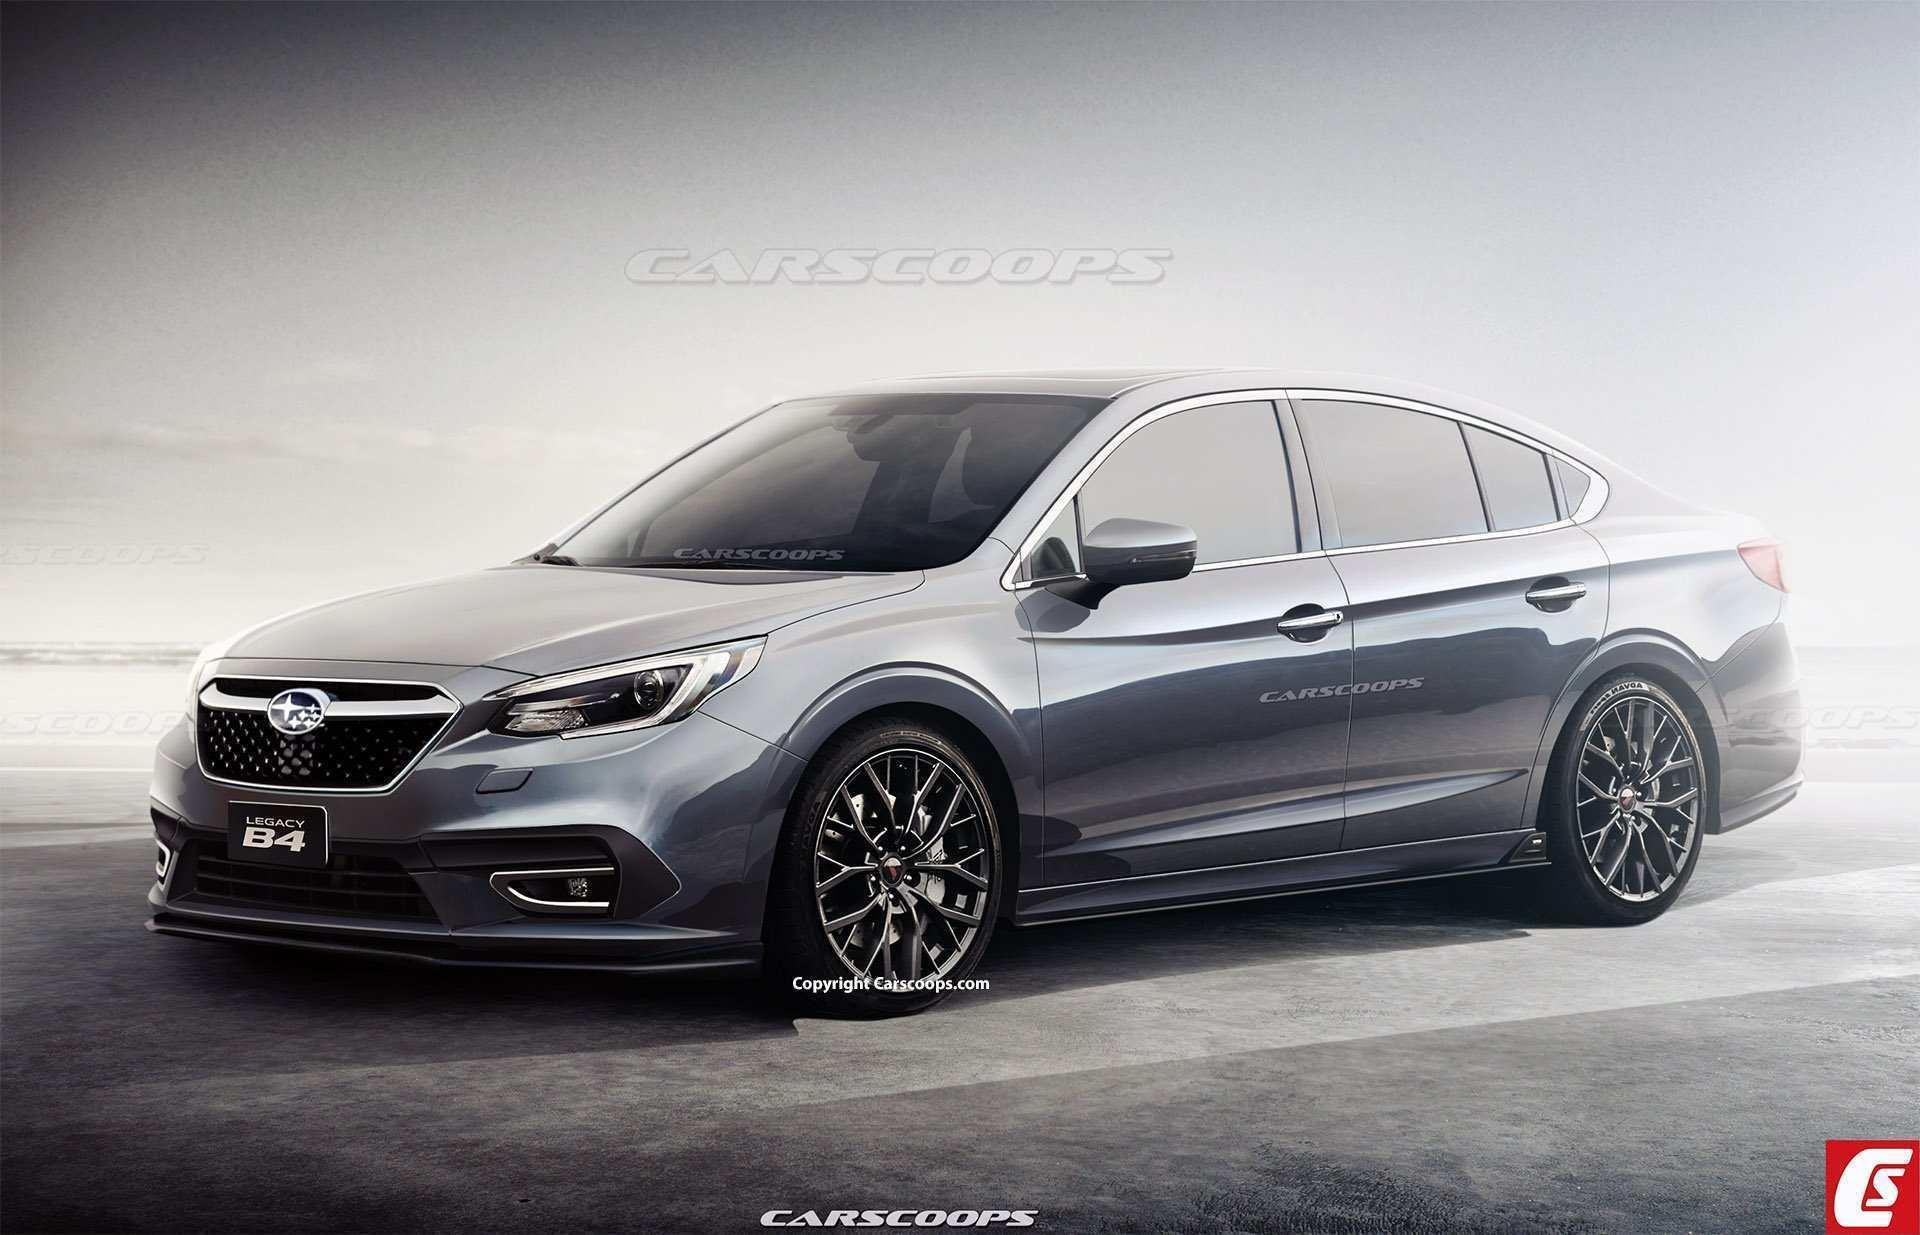 13 New 2020 Subaru Lineup Redesign by 2020 Subaru Lineup